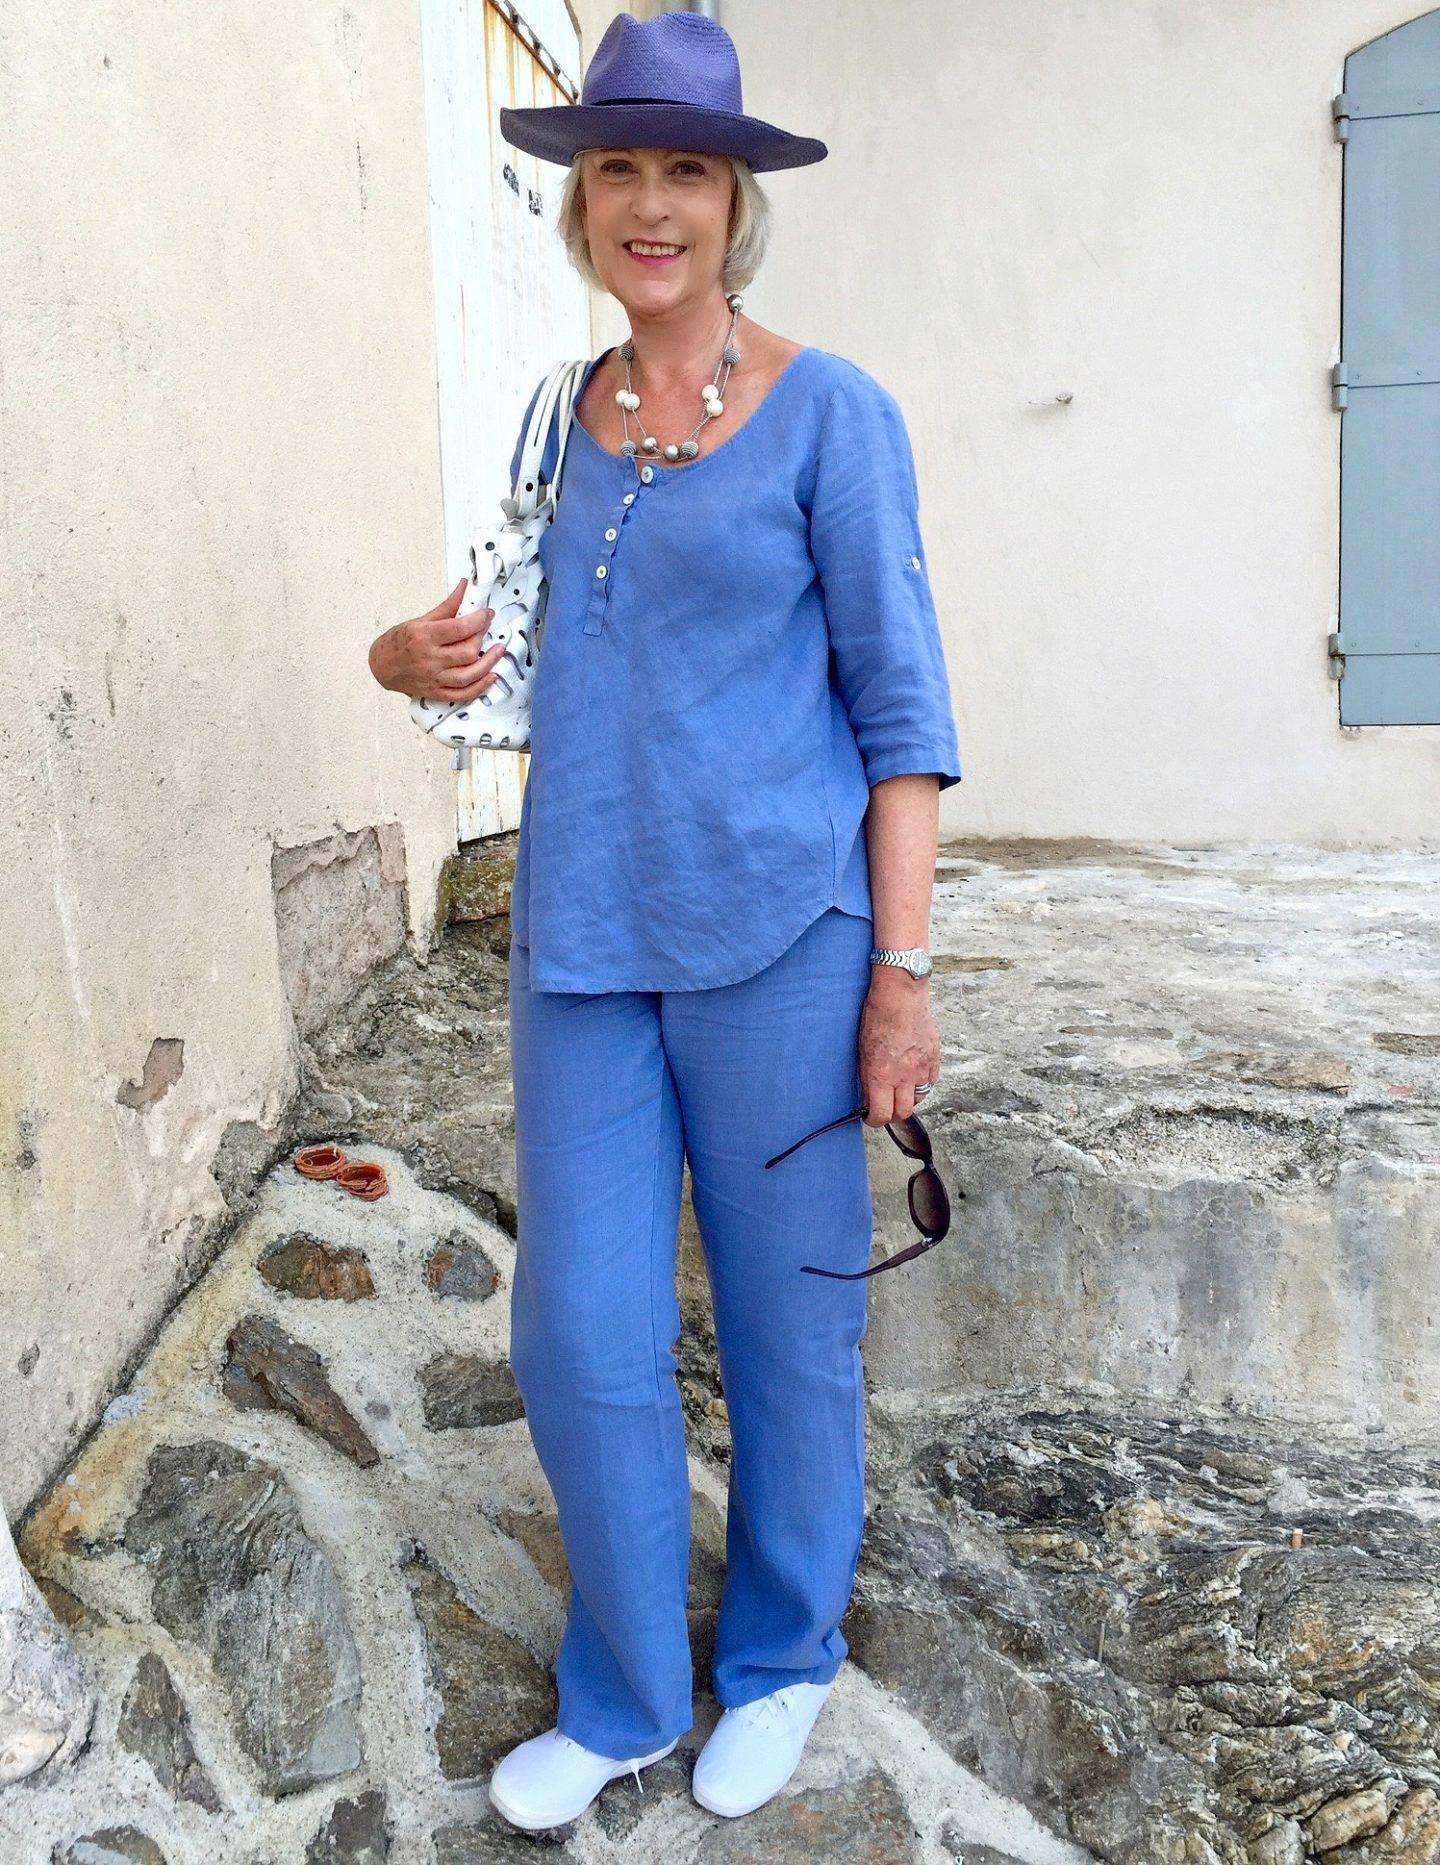 Linen for summer - Blue hat